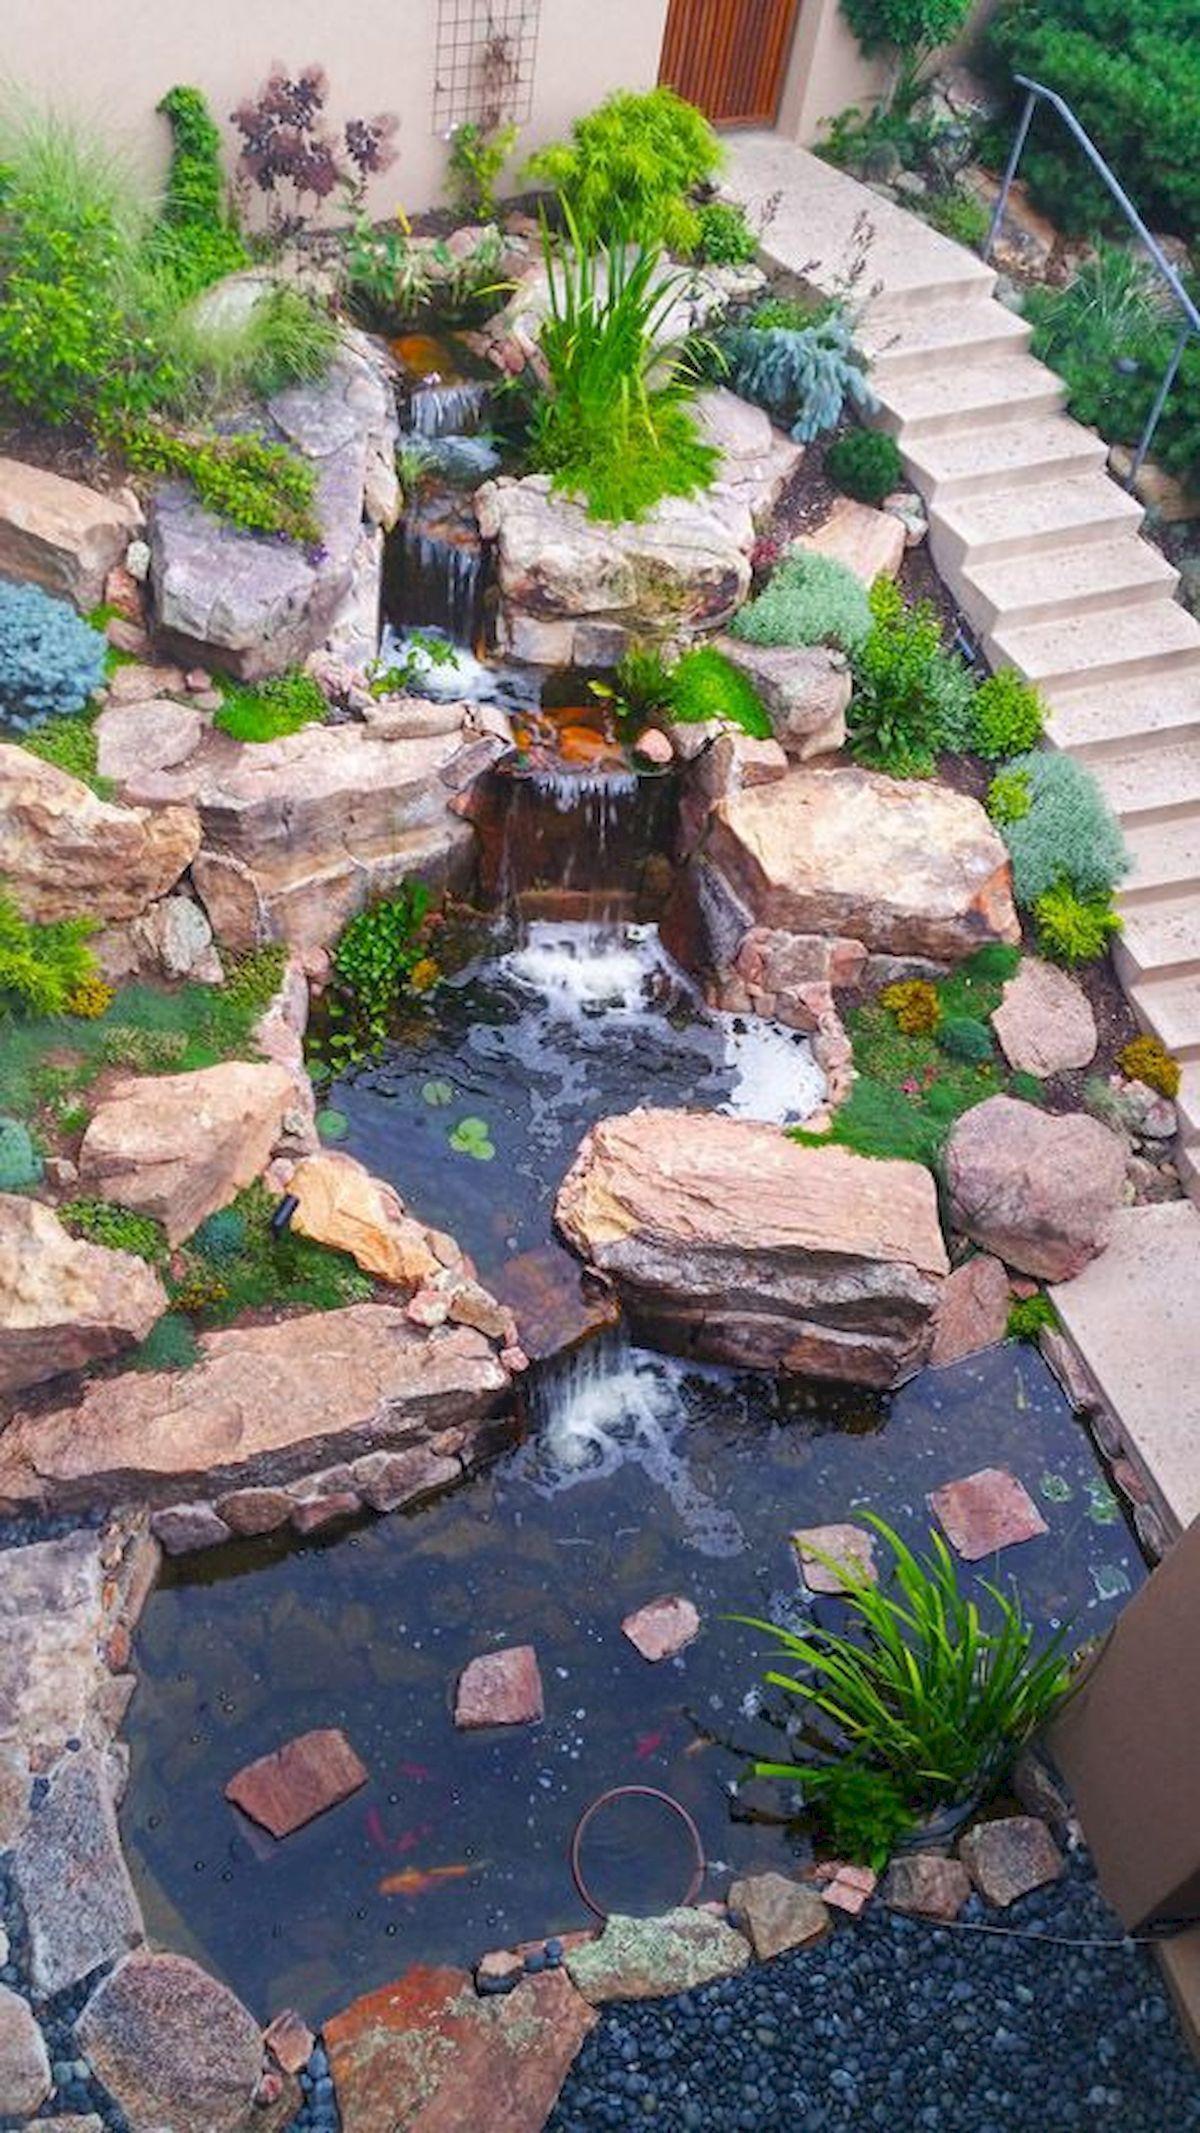 14 Clever Ideas How To Improve Backyard Pond Ideas With ... tout Bassin De Jardin Préformé